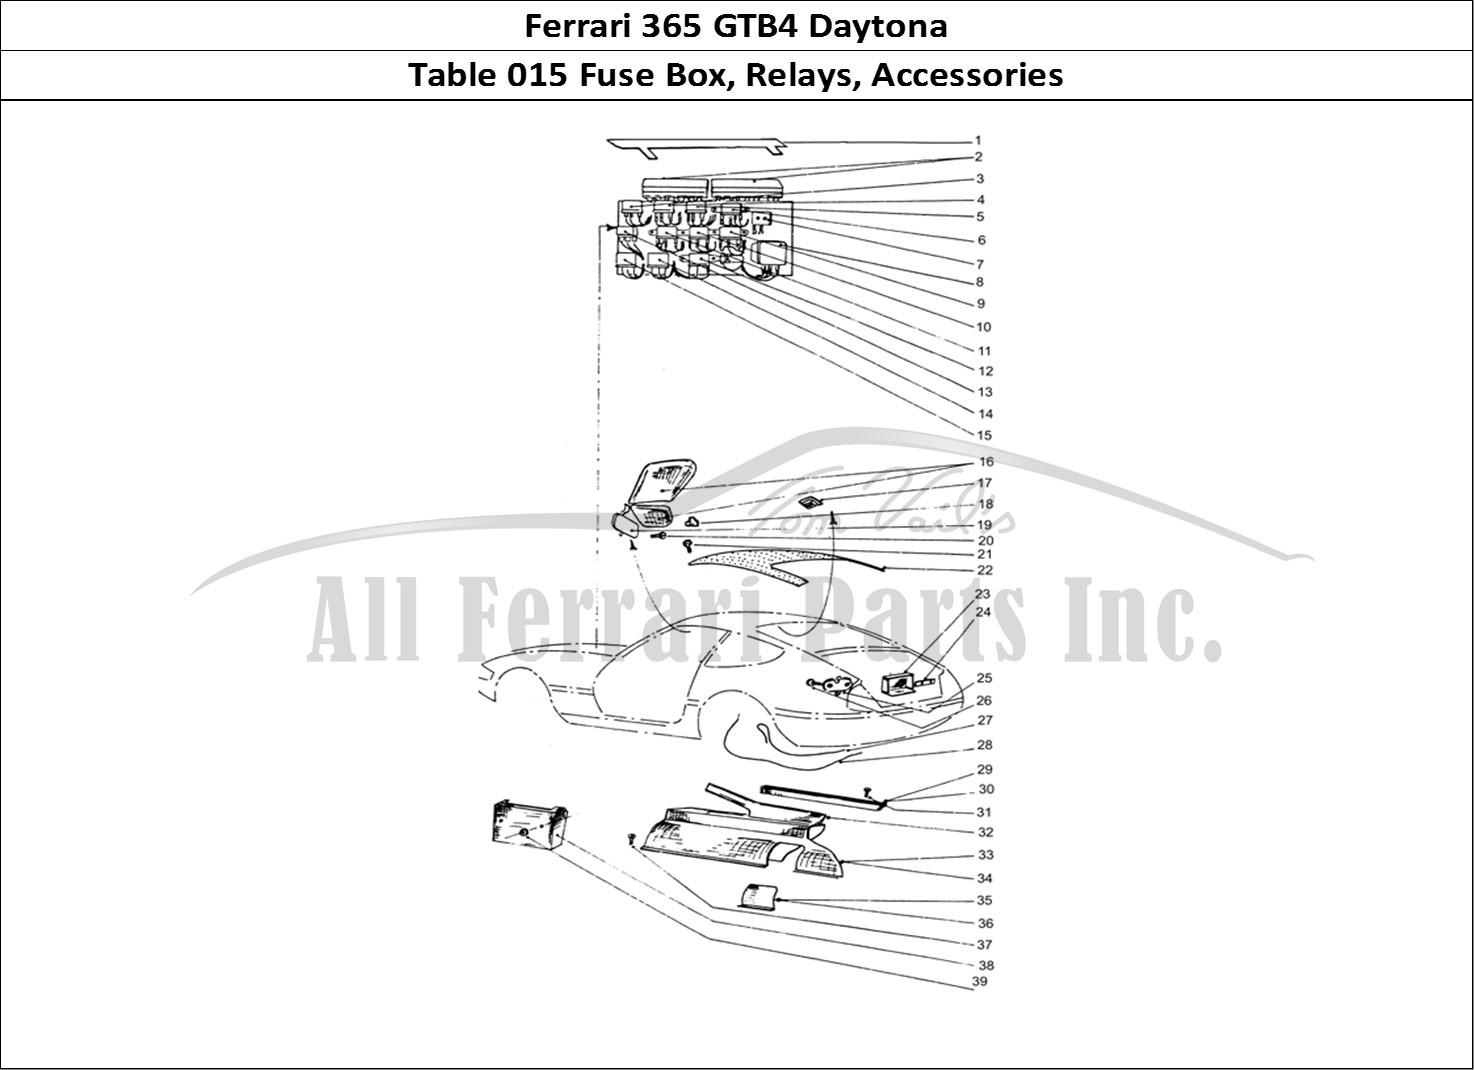 Buy Original Ferrari 365 Gtb4 Daytona 015 Fuse Box Relays